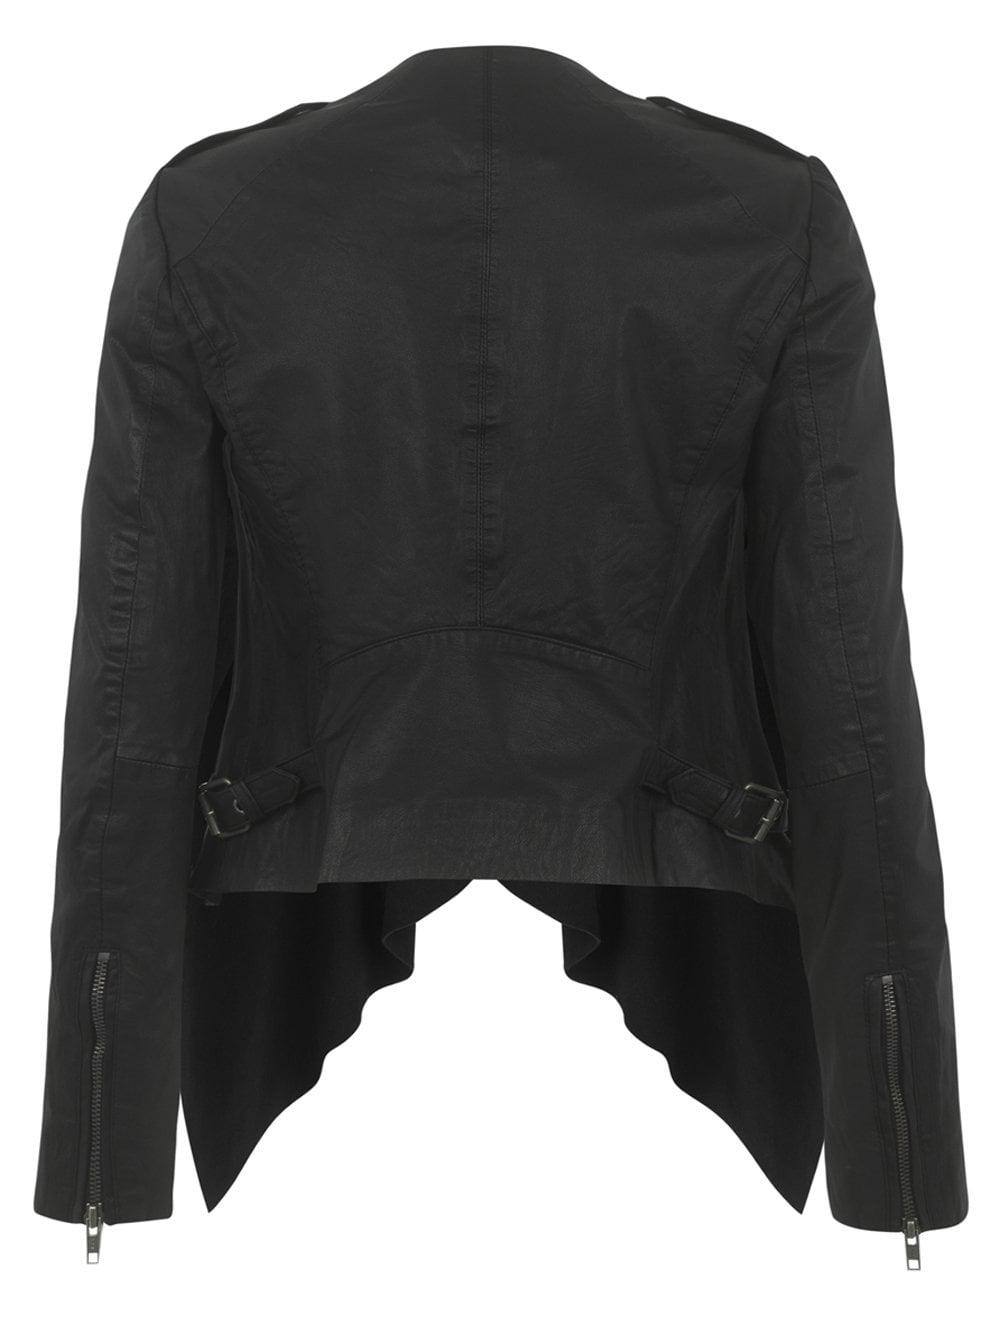 Lupus Leather-Suede Drape Biker Jacket in Black